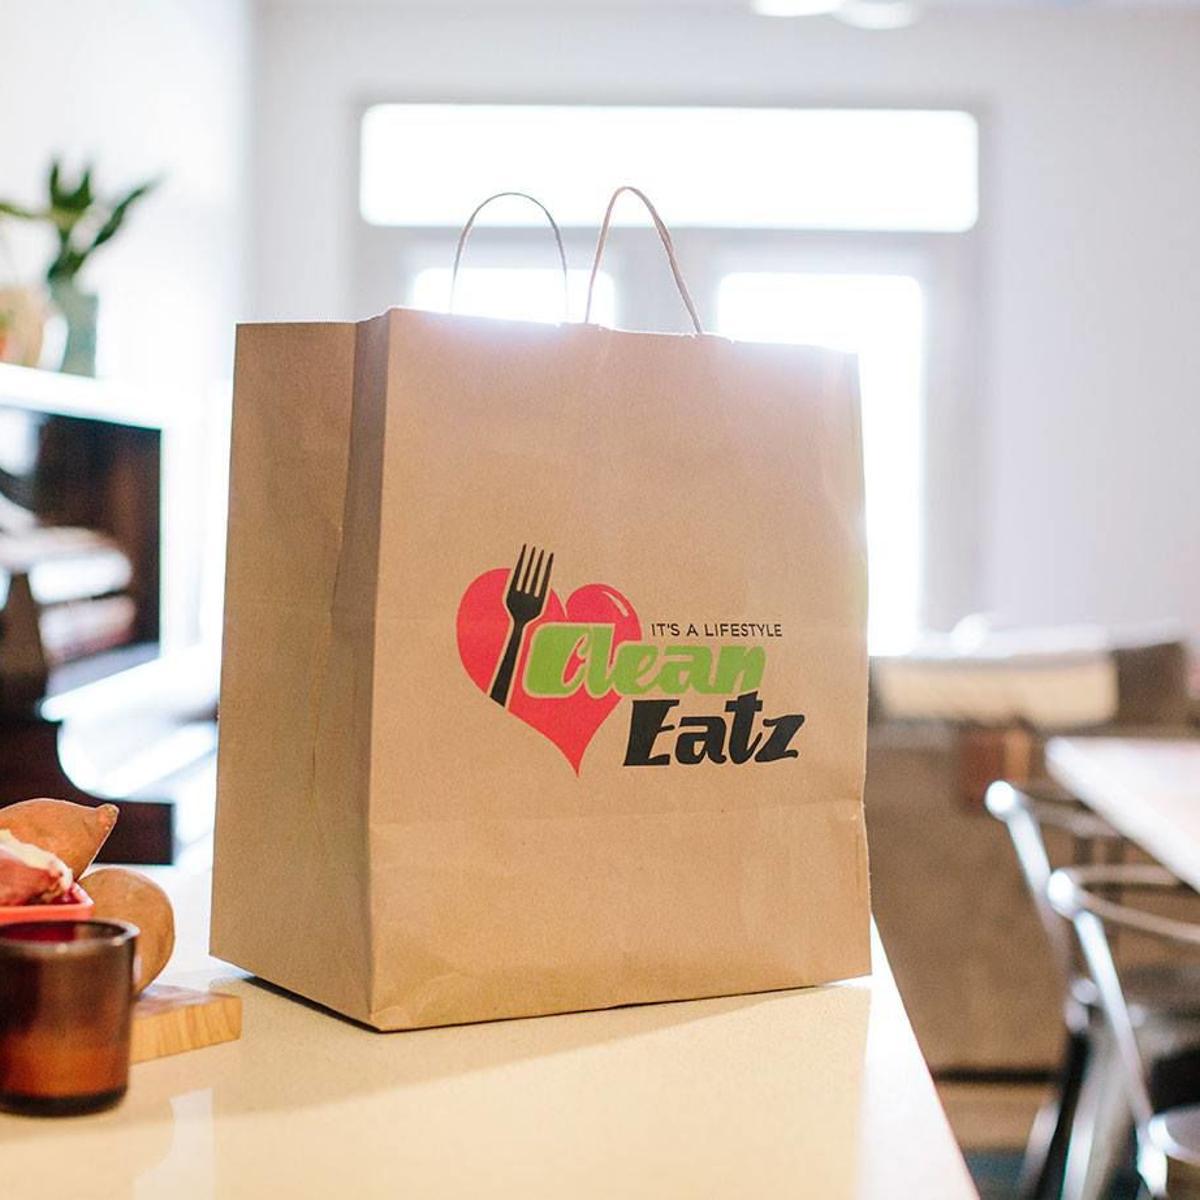 Clean Eatz To Open In Winston Salem Dining Greensboro Com